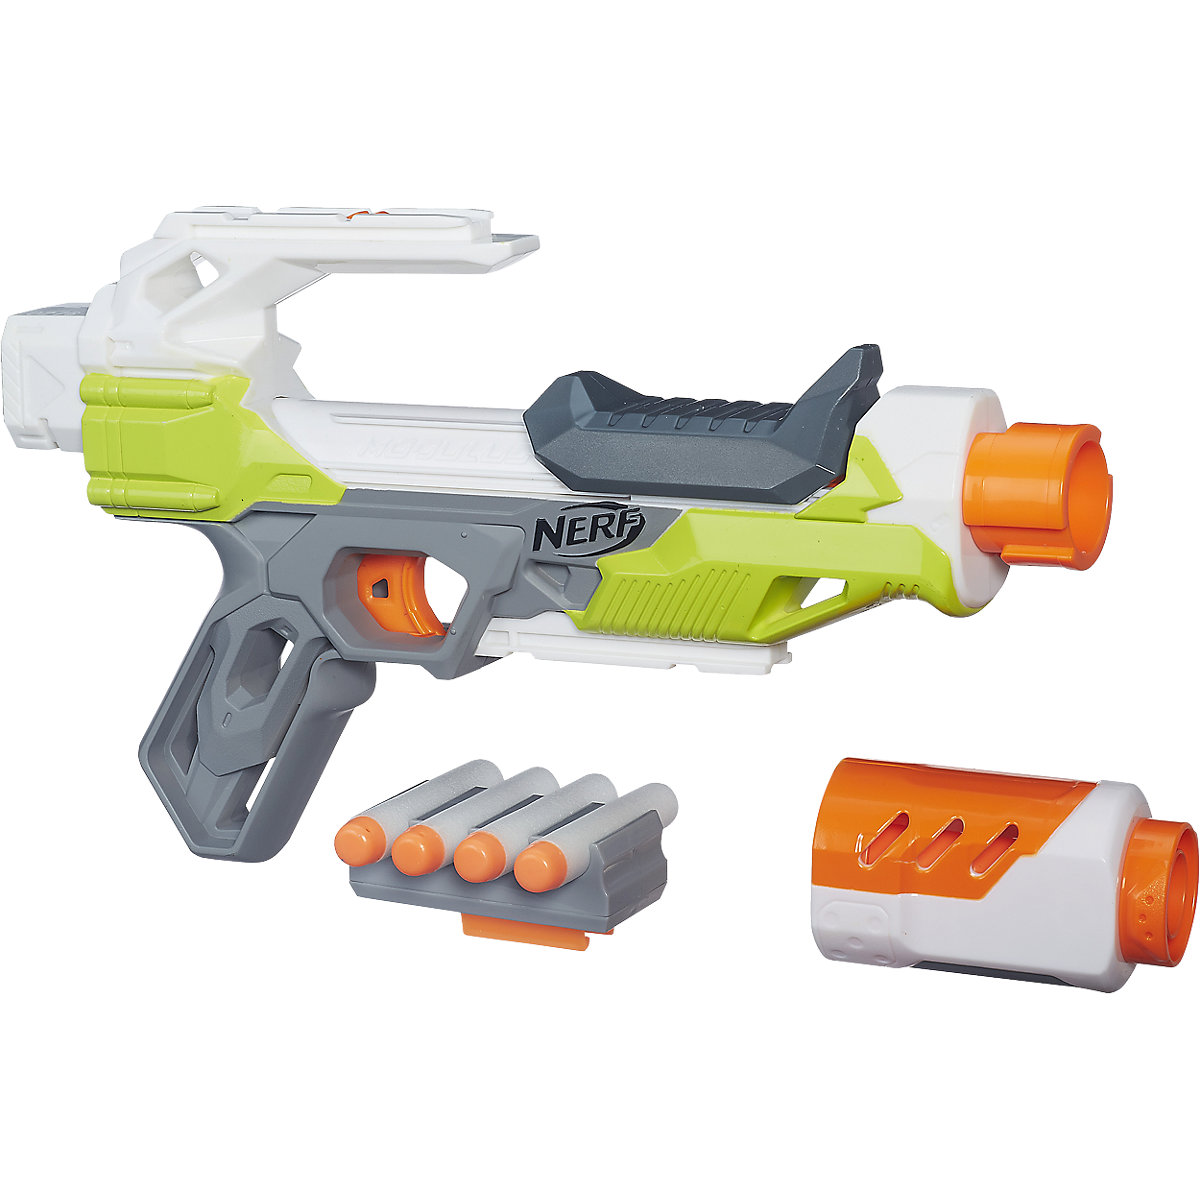 Toy Guns NERF 4306449 Children Kids Toy Gun Weapon Blasters Boys Shooting games Outdoor play MTpromo